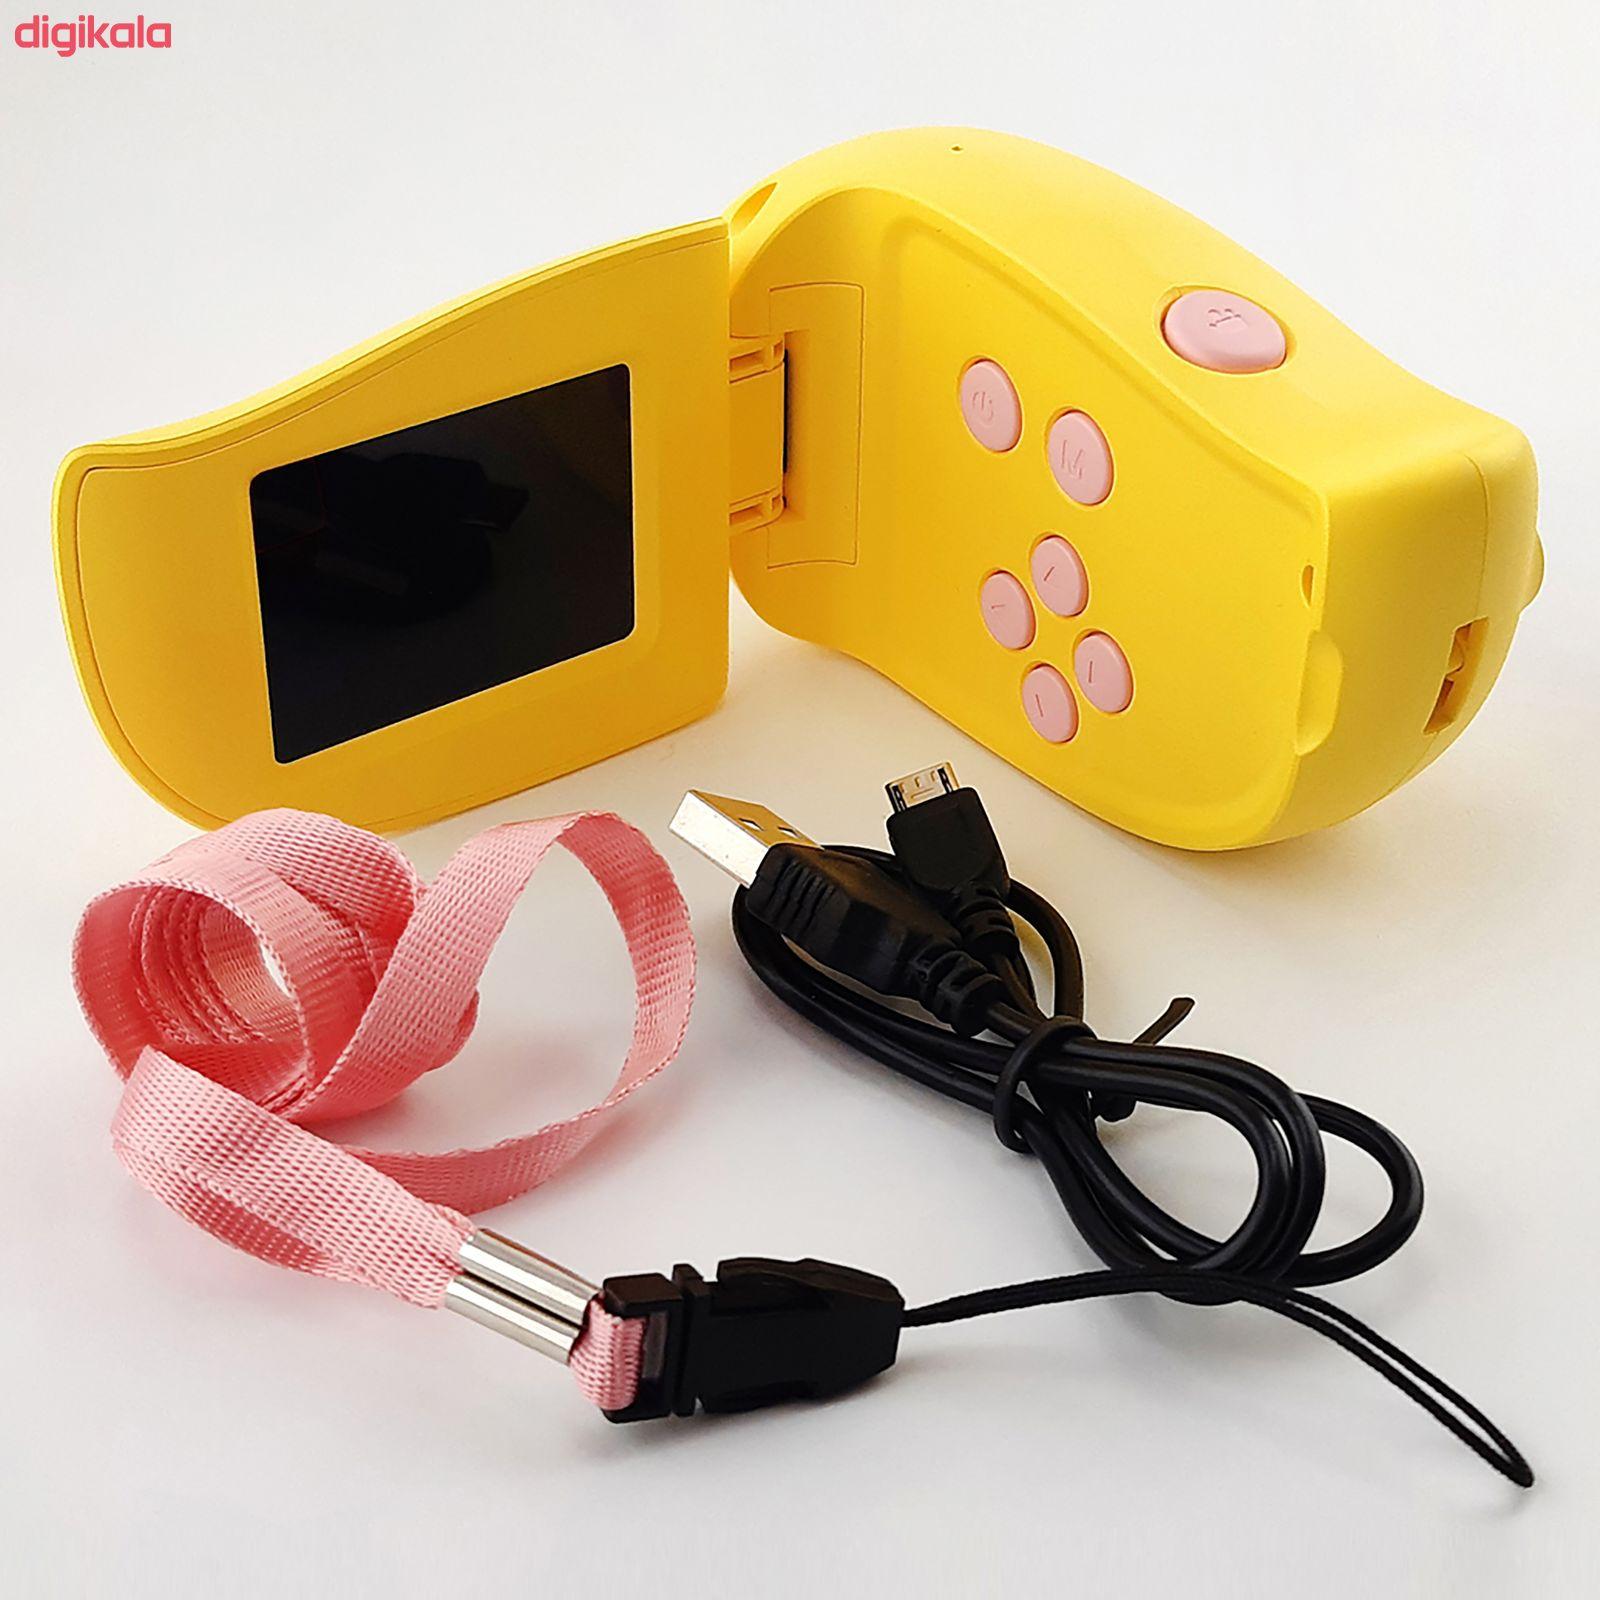 دوربین دیجیتال آکسون مدل AX6066 main 1 6